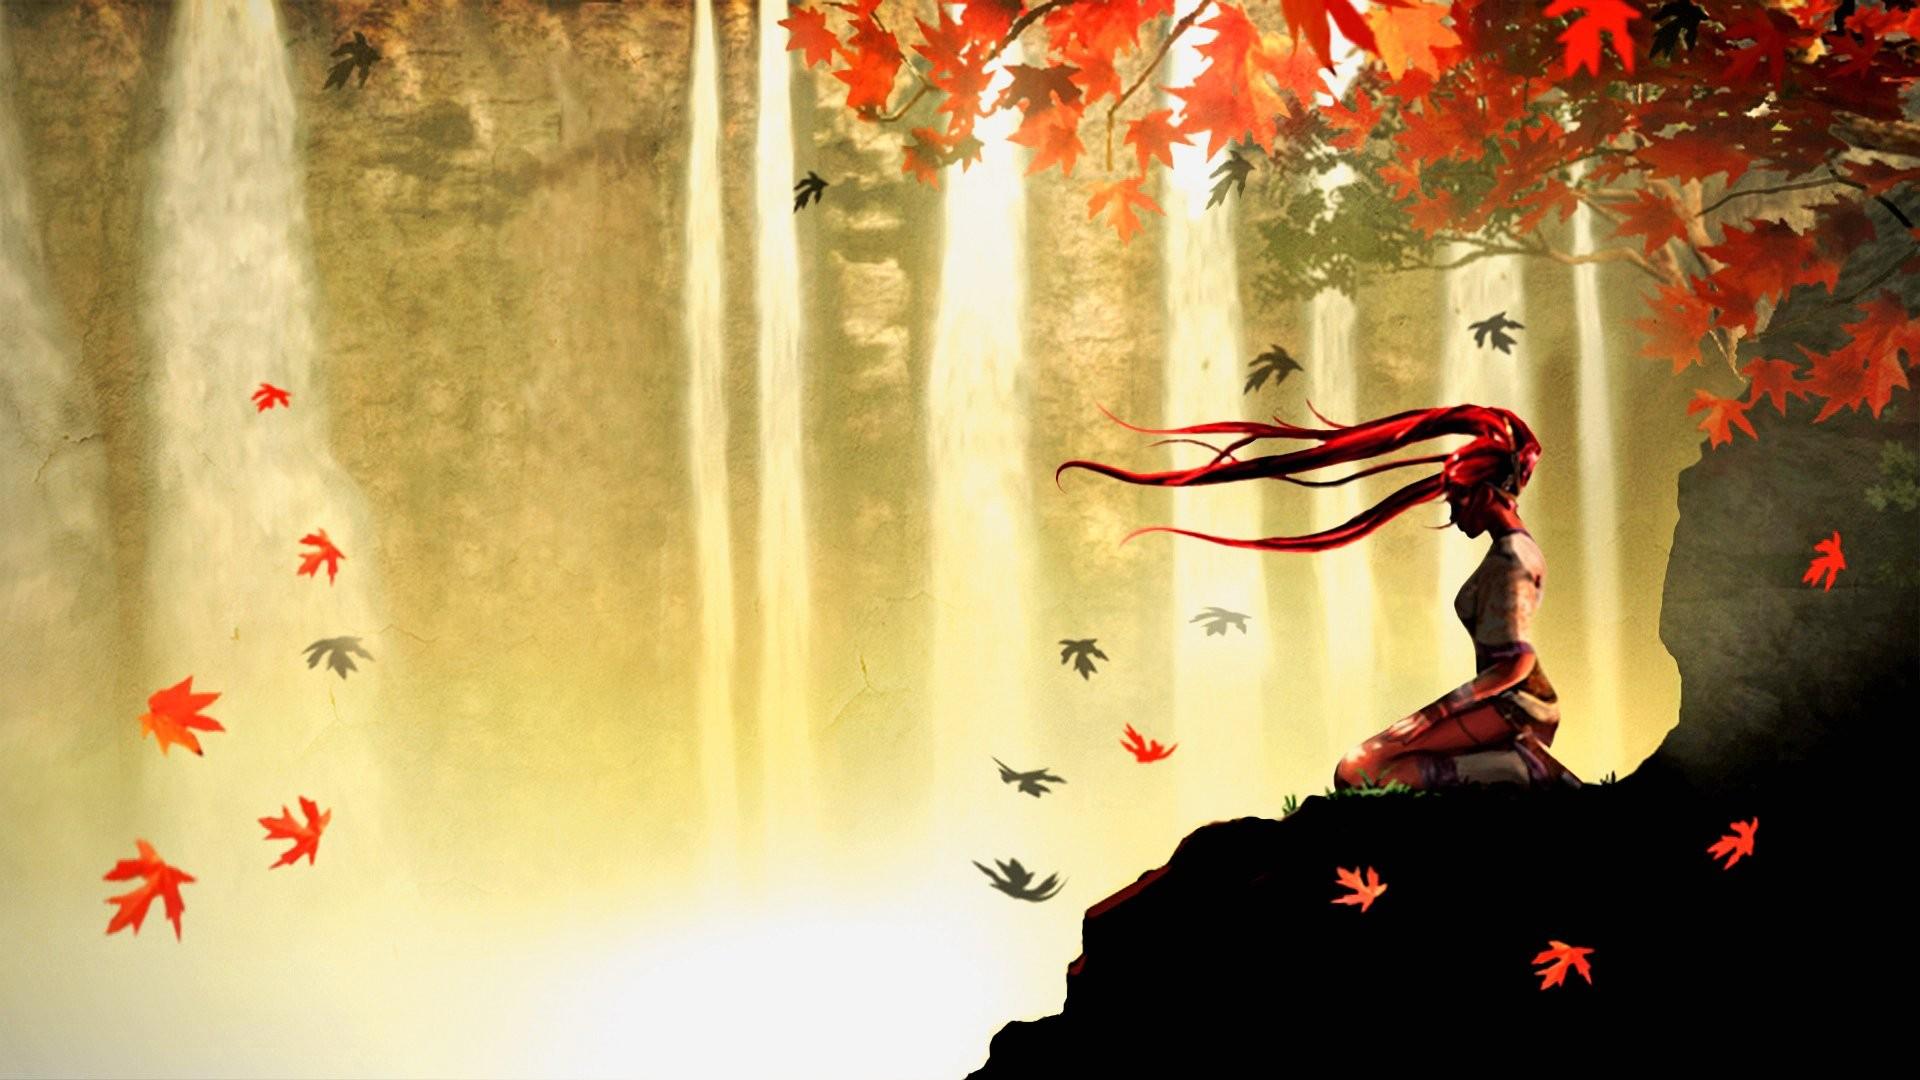 Meditation wallpaper download free beautiful wallpapers - Meditation art wallpaper ...